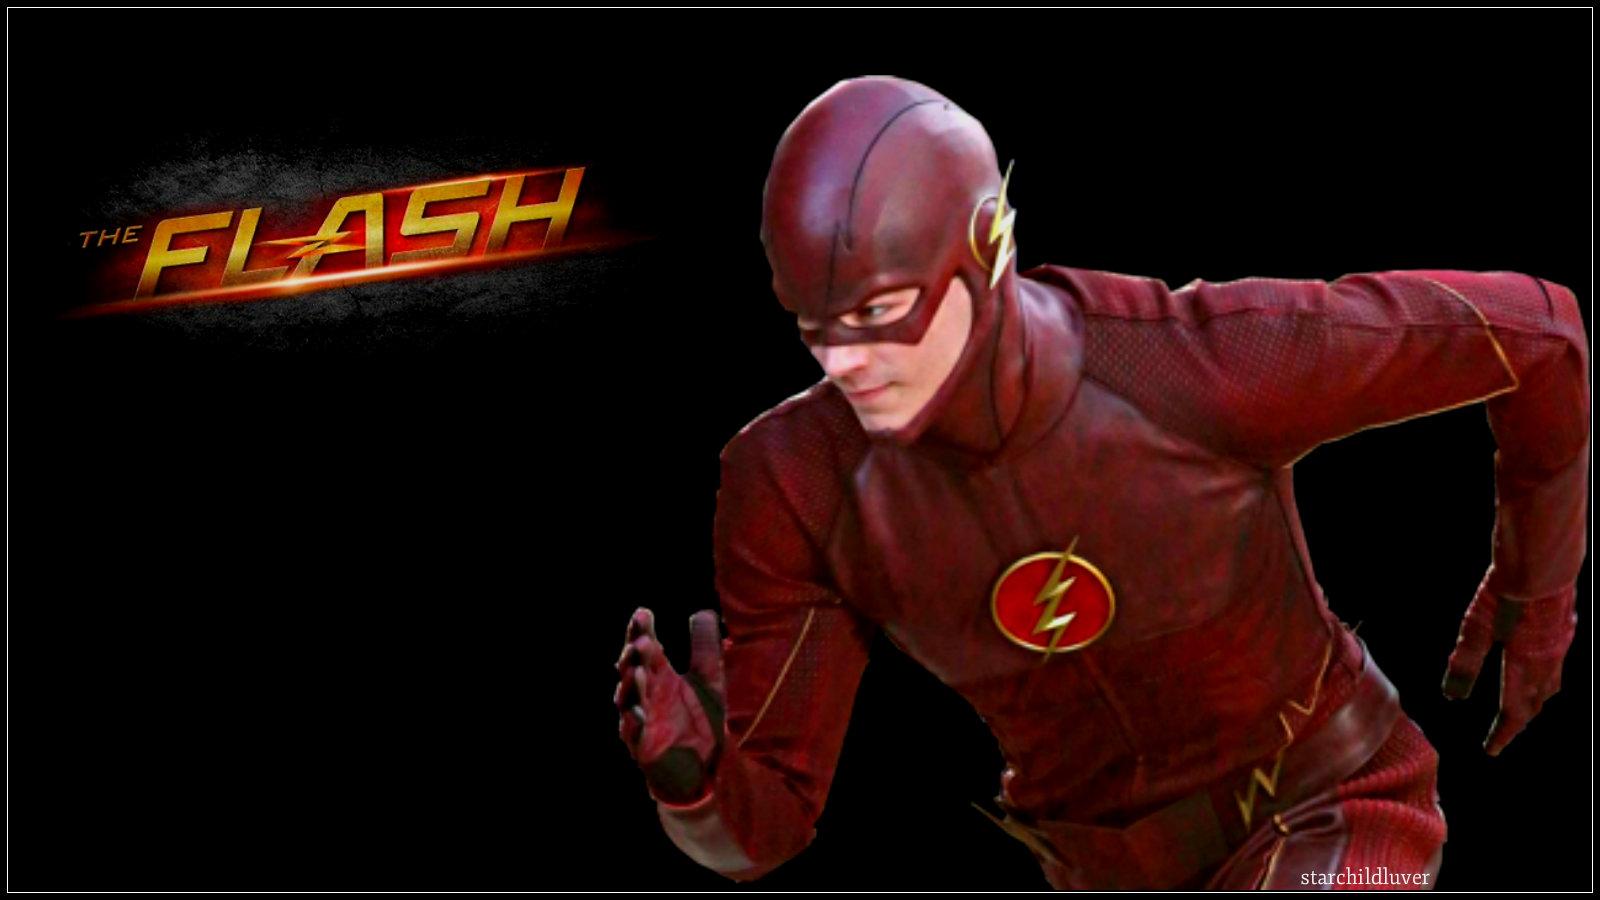 The Flash The Flash Cw Wallpaper 37771517 Fanpop